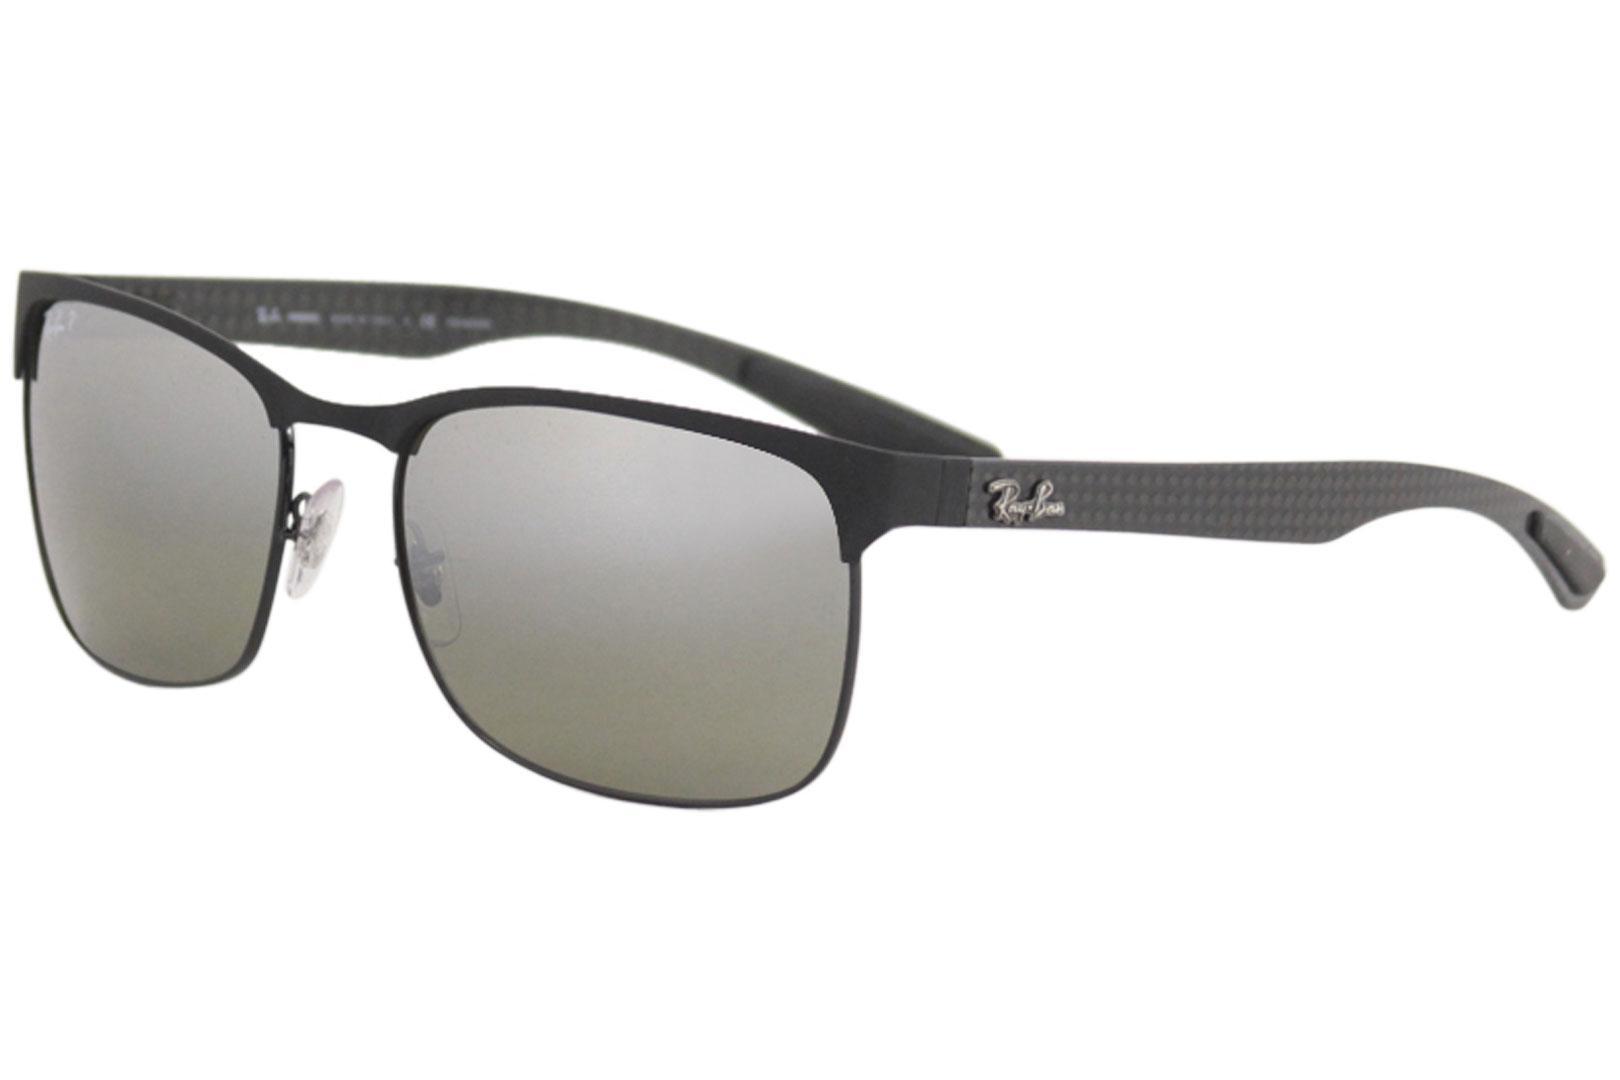 004315d4bd Ray Ban Men s Chromance RB8319CH 8319 Rectangle RayBan Polarized Sunglasses  by Ray Ban